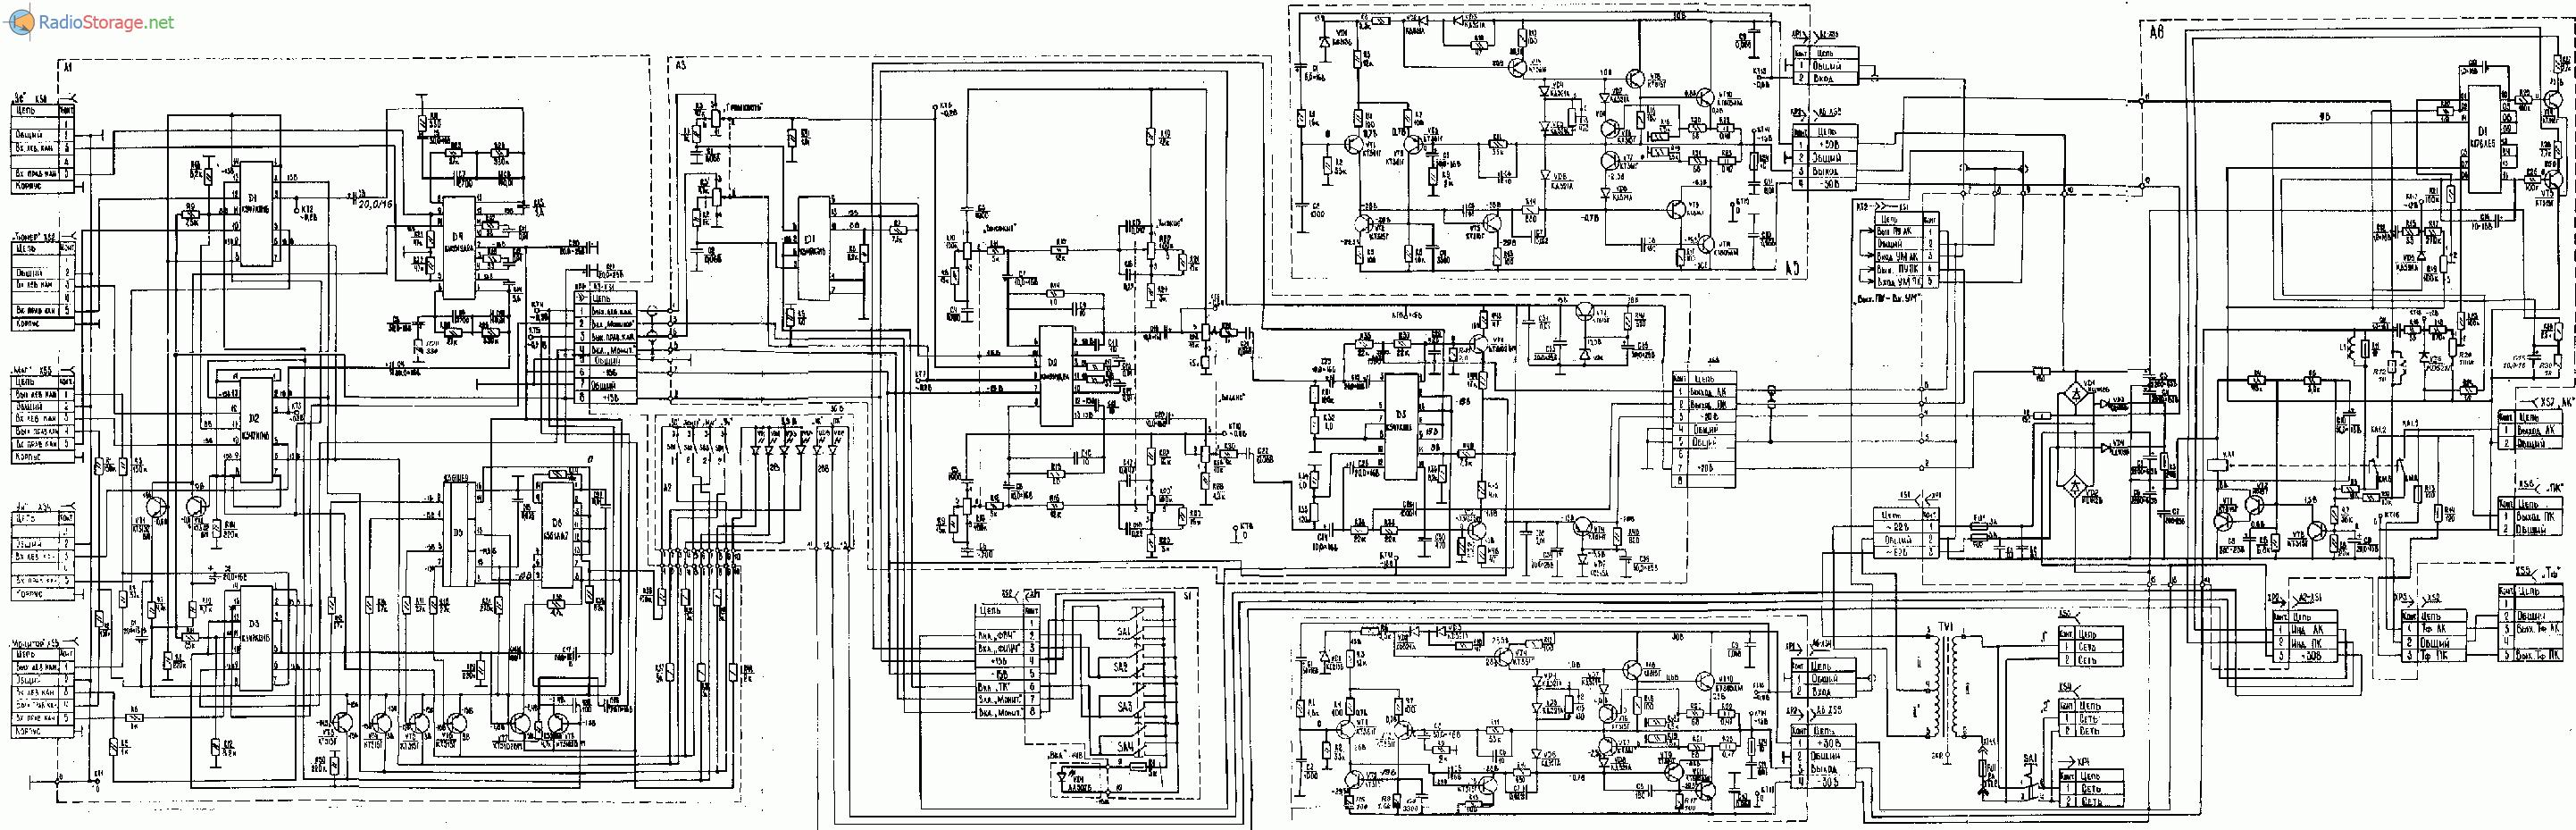 Усилитель Электроника УК-043 стерео, схема